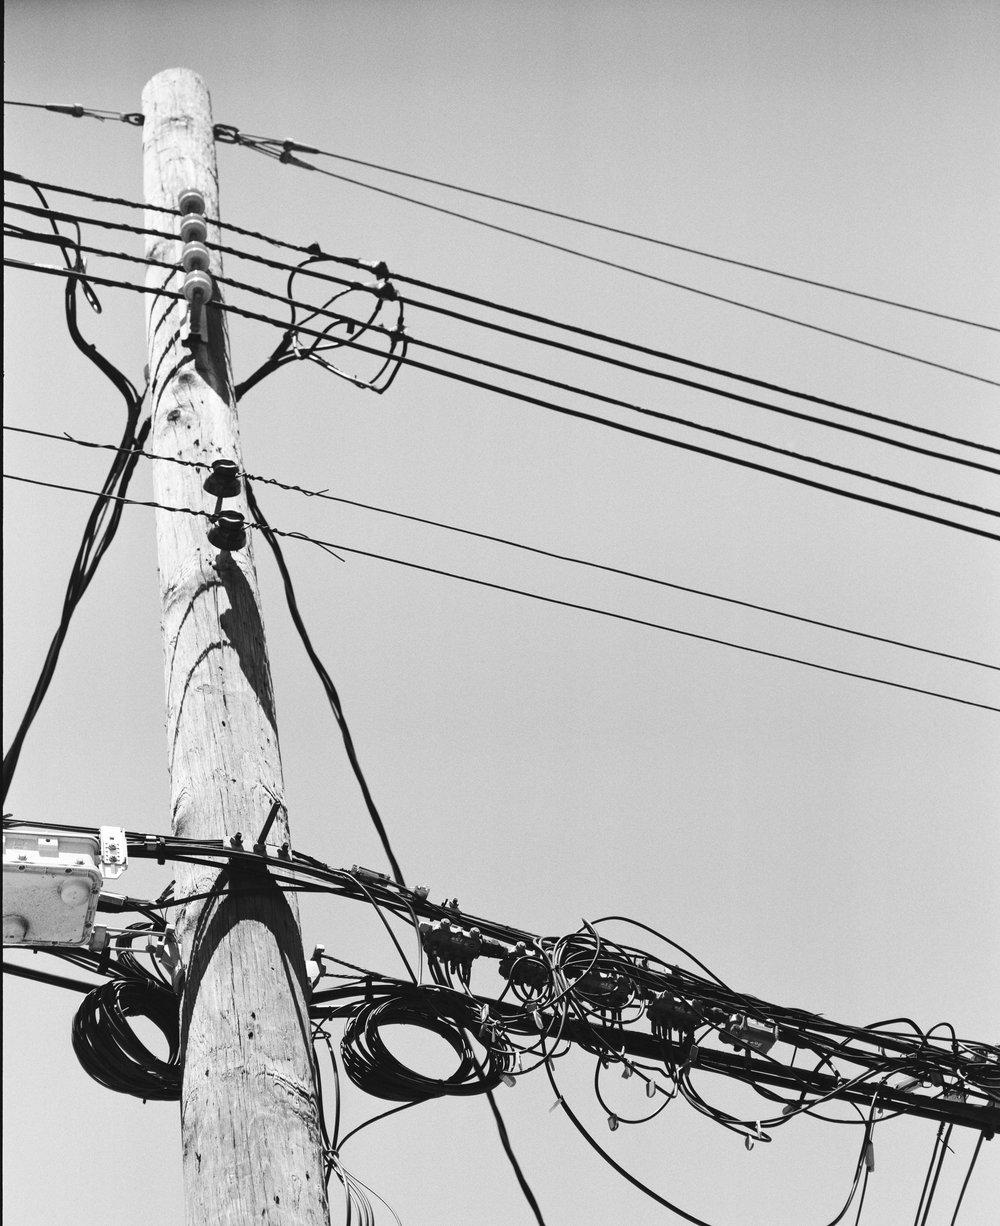 Film1177_34.JPG